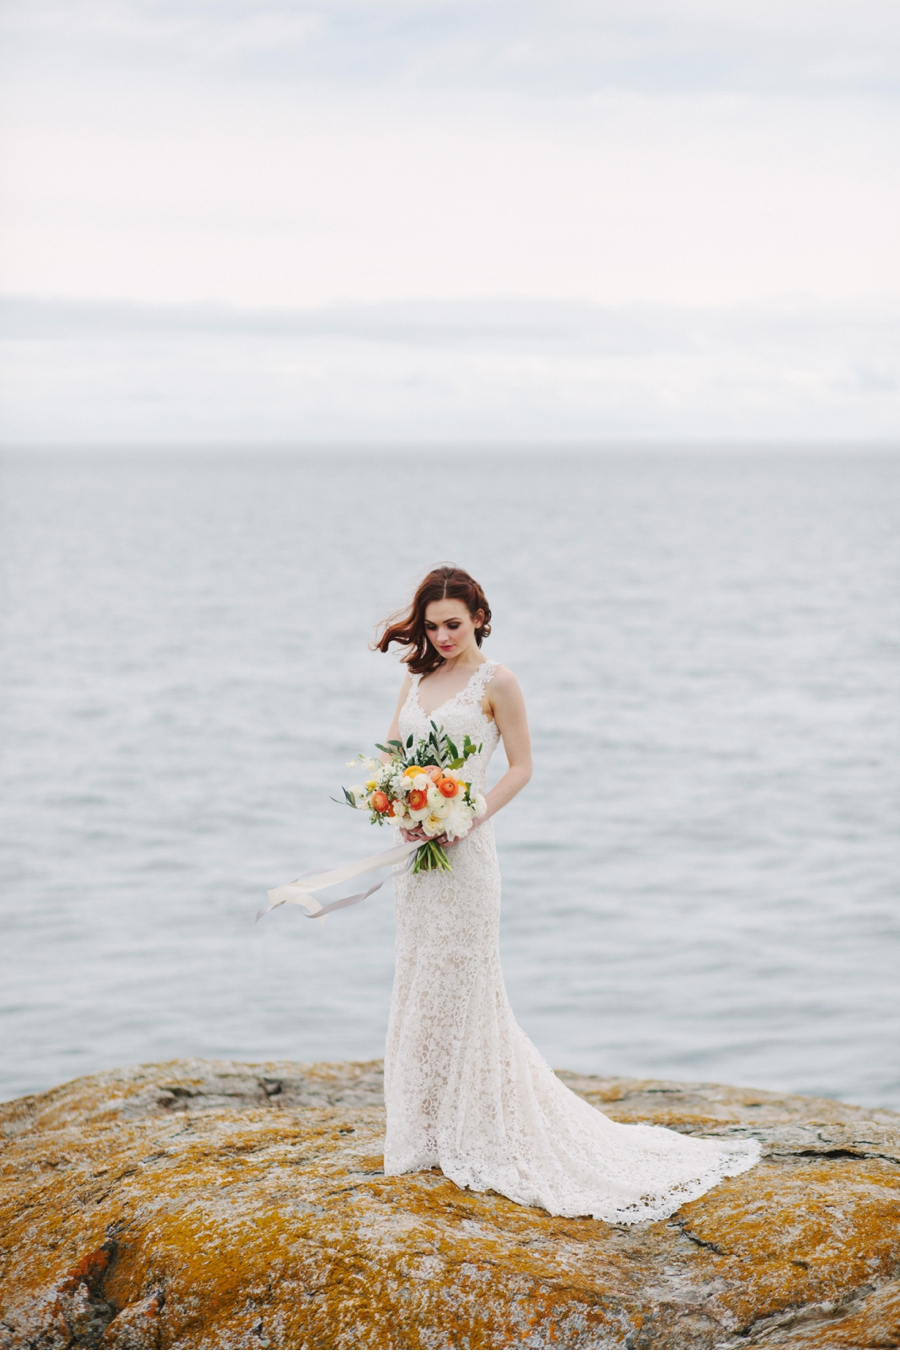 Vancouver-Island-Wedding-Inspiration